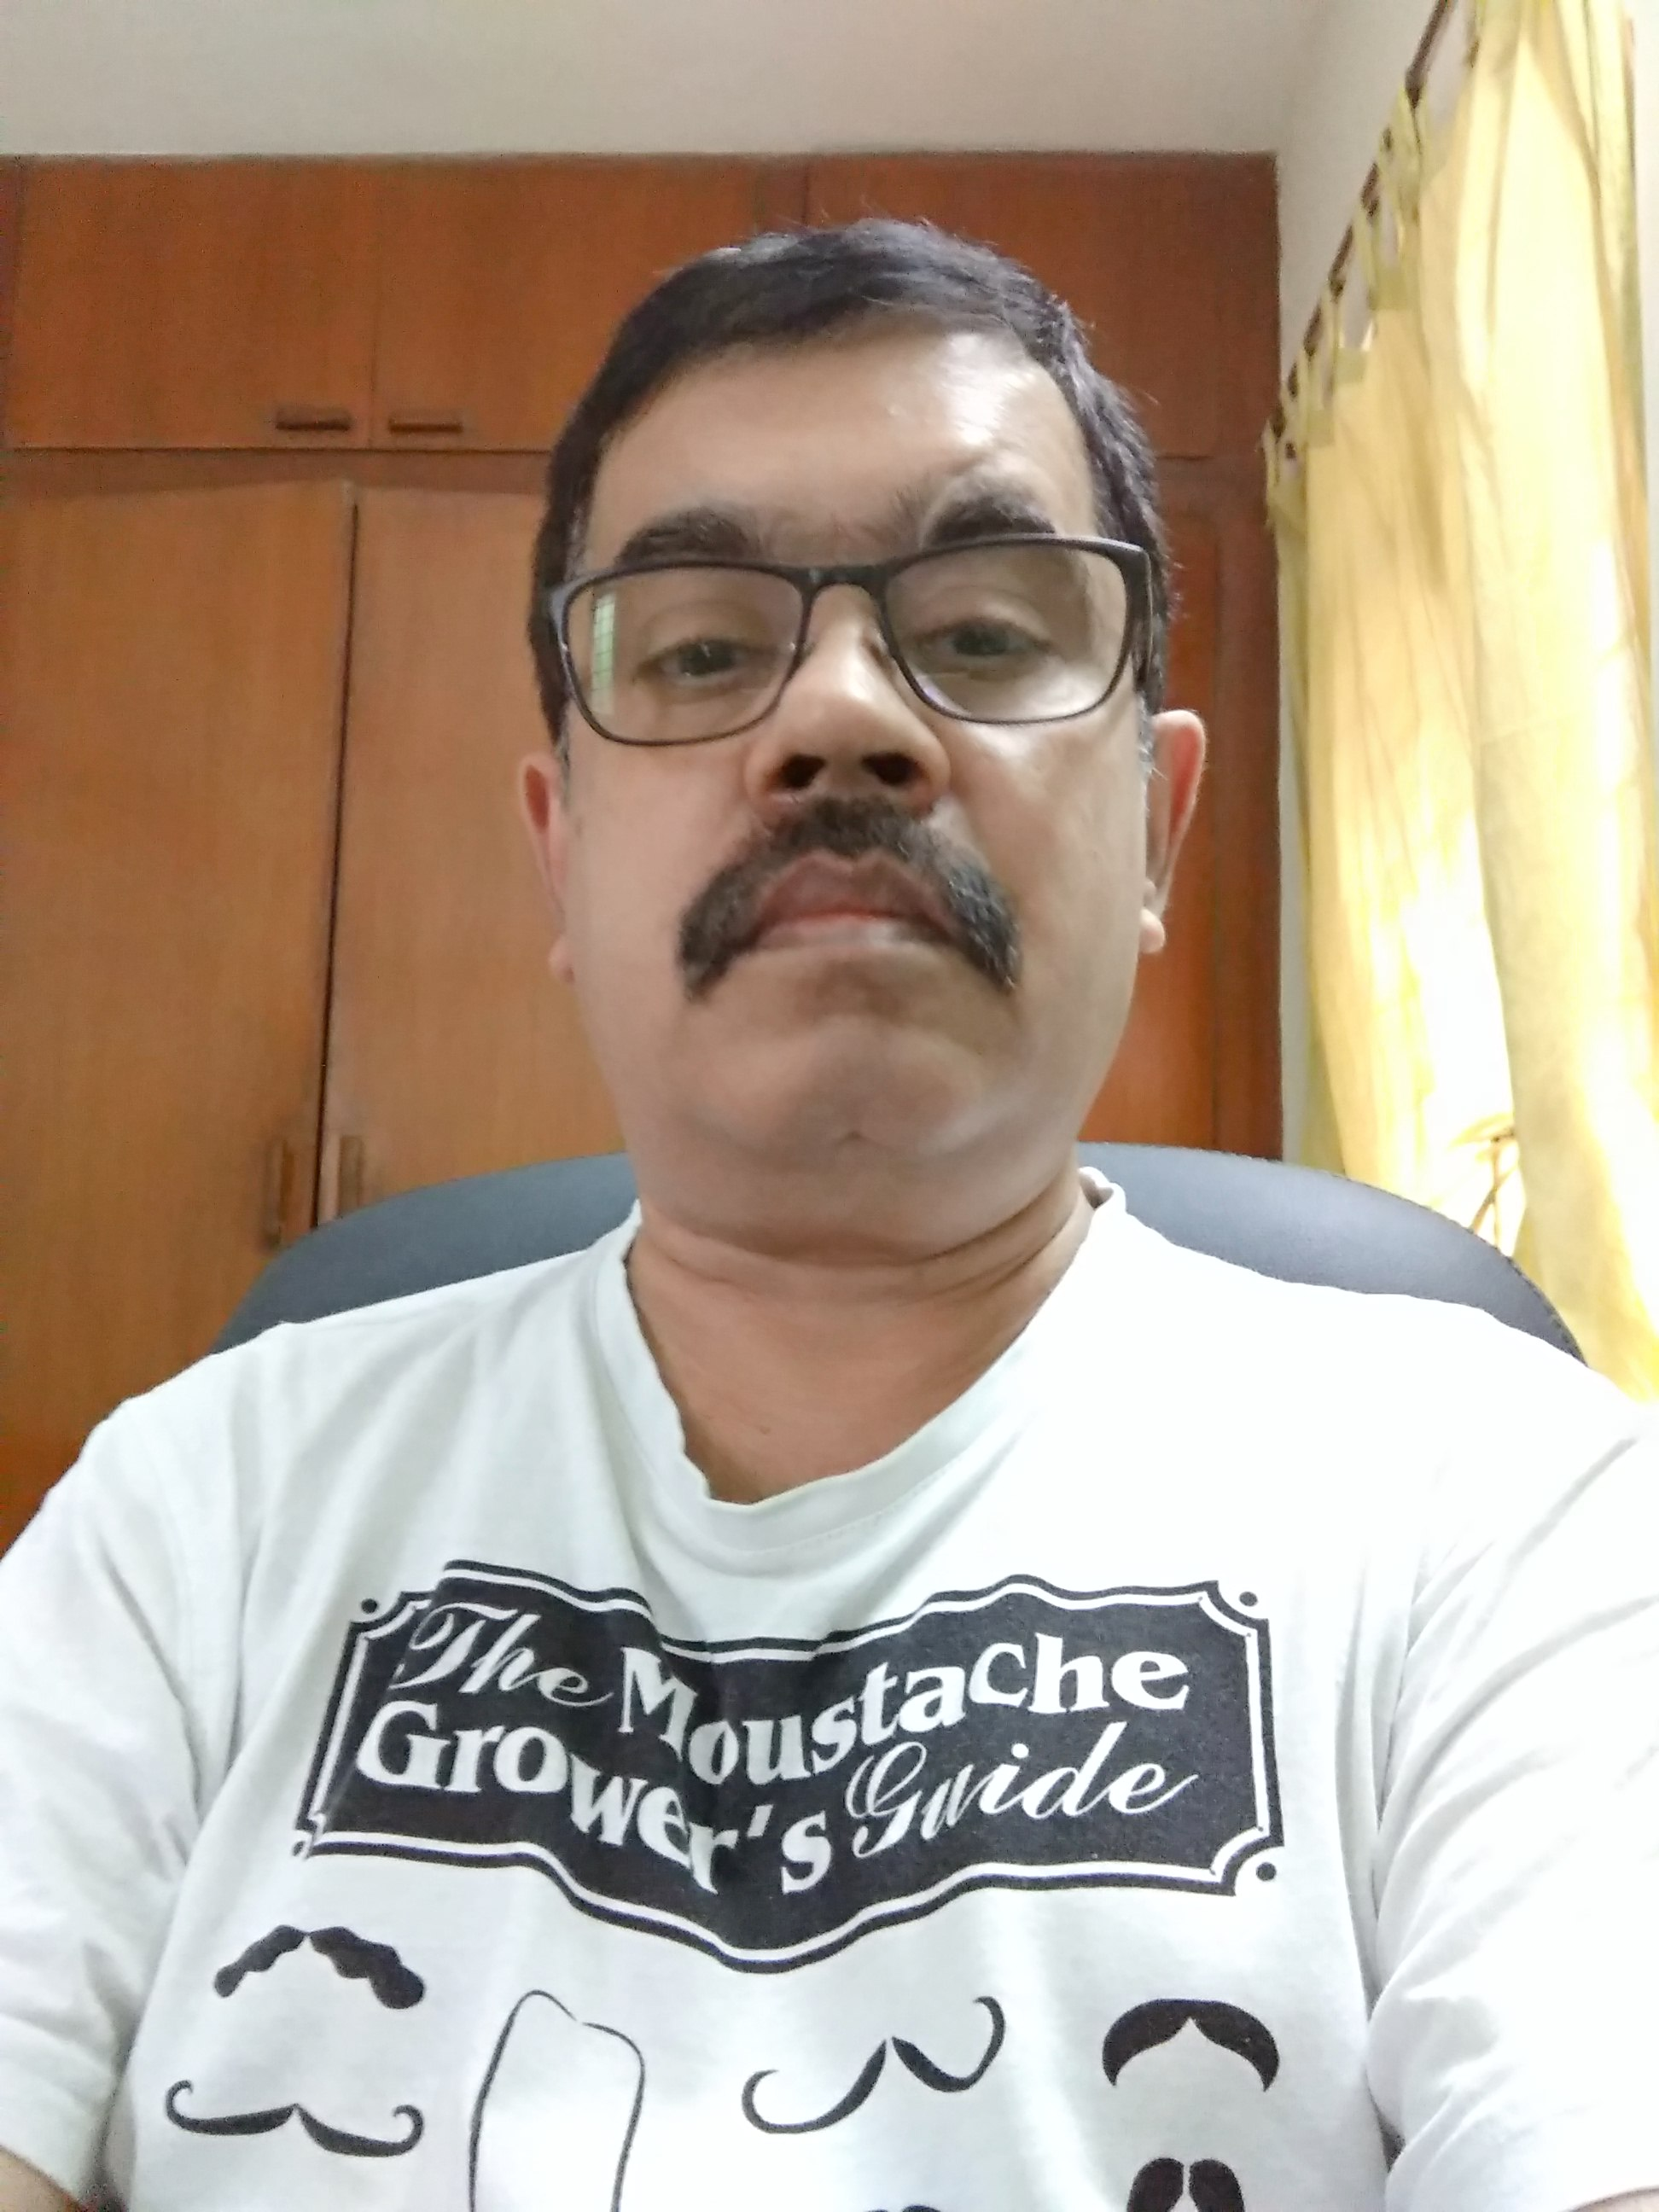 IMG_20170226_161833